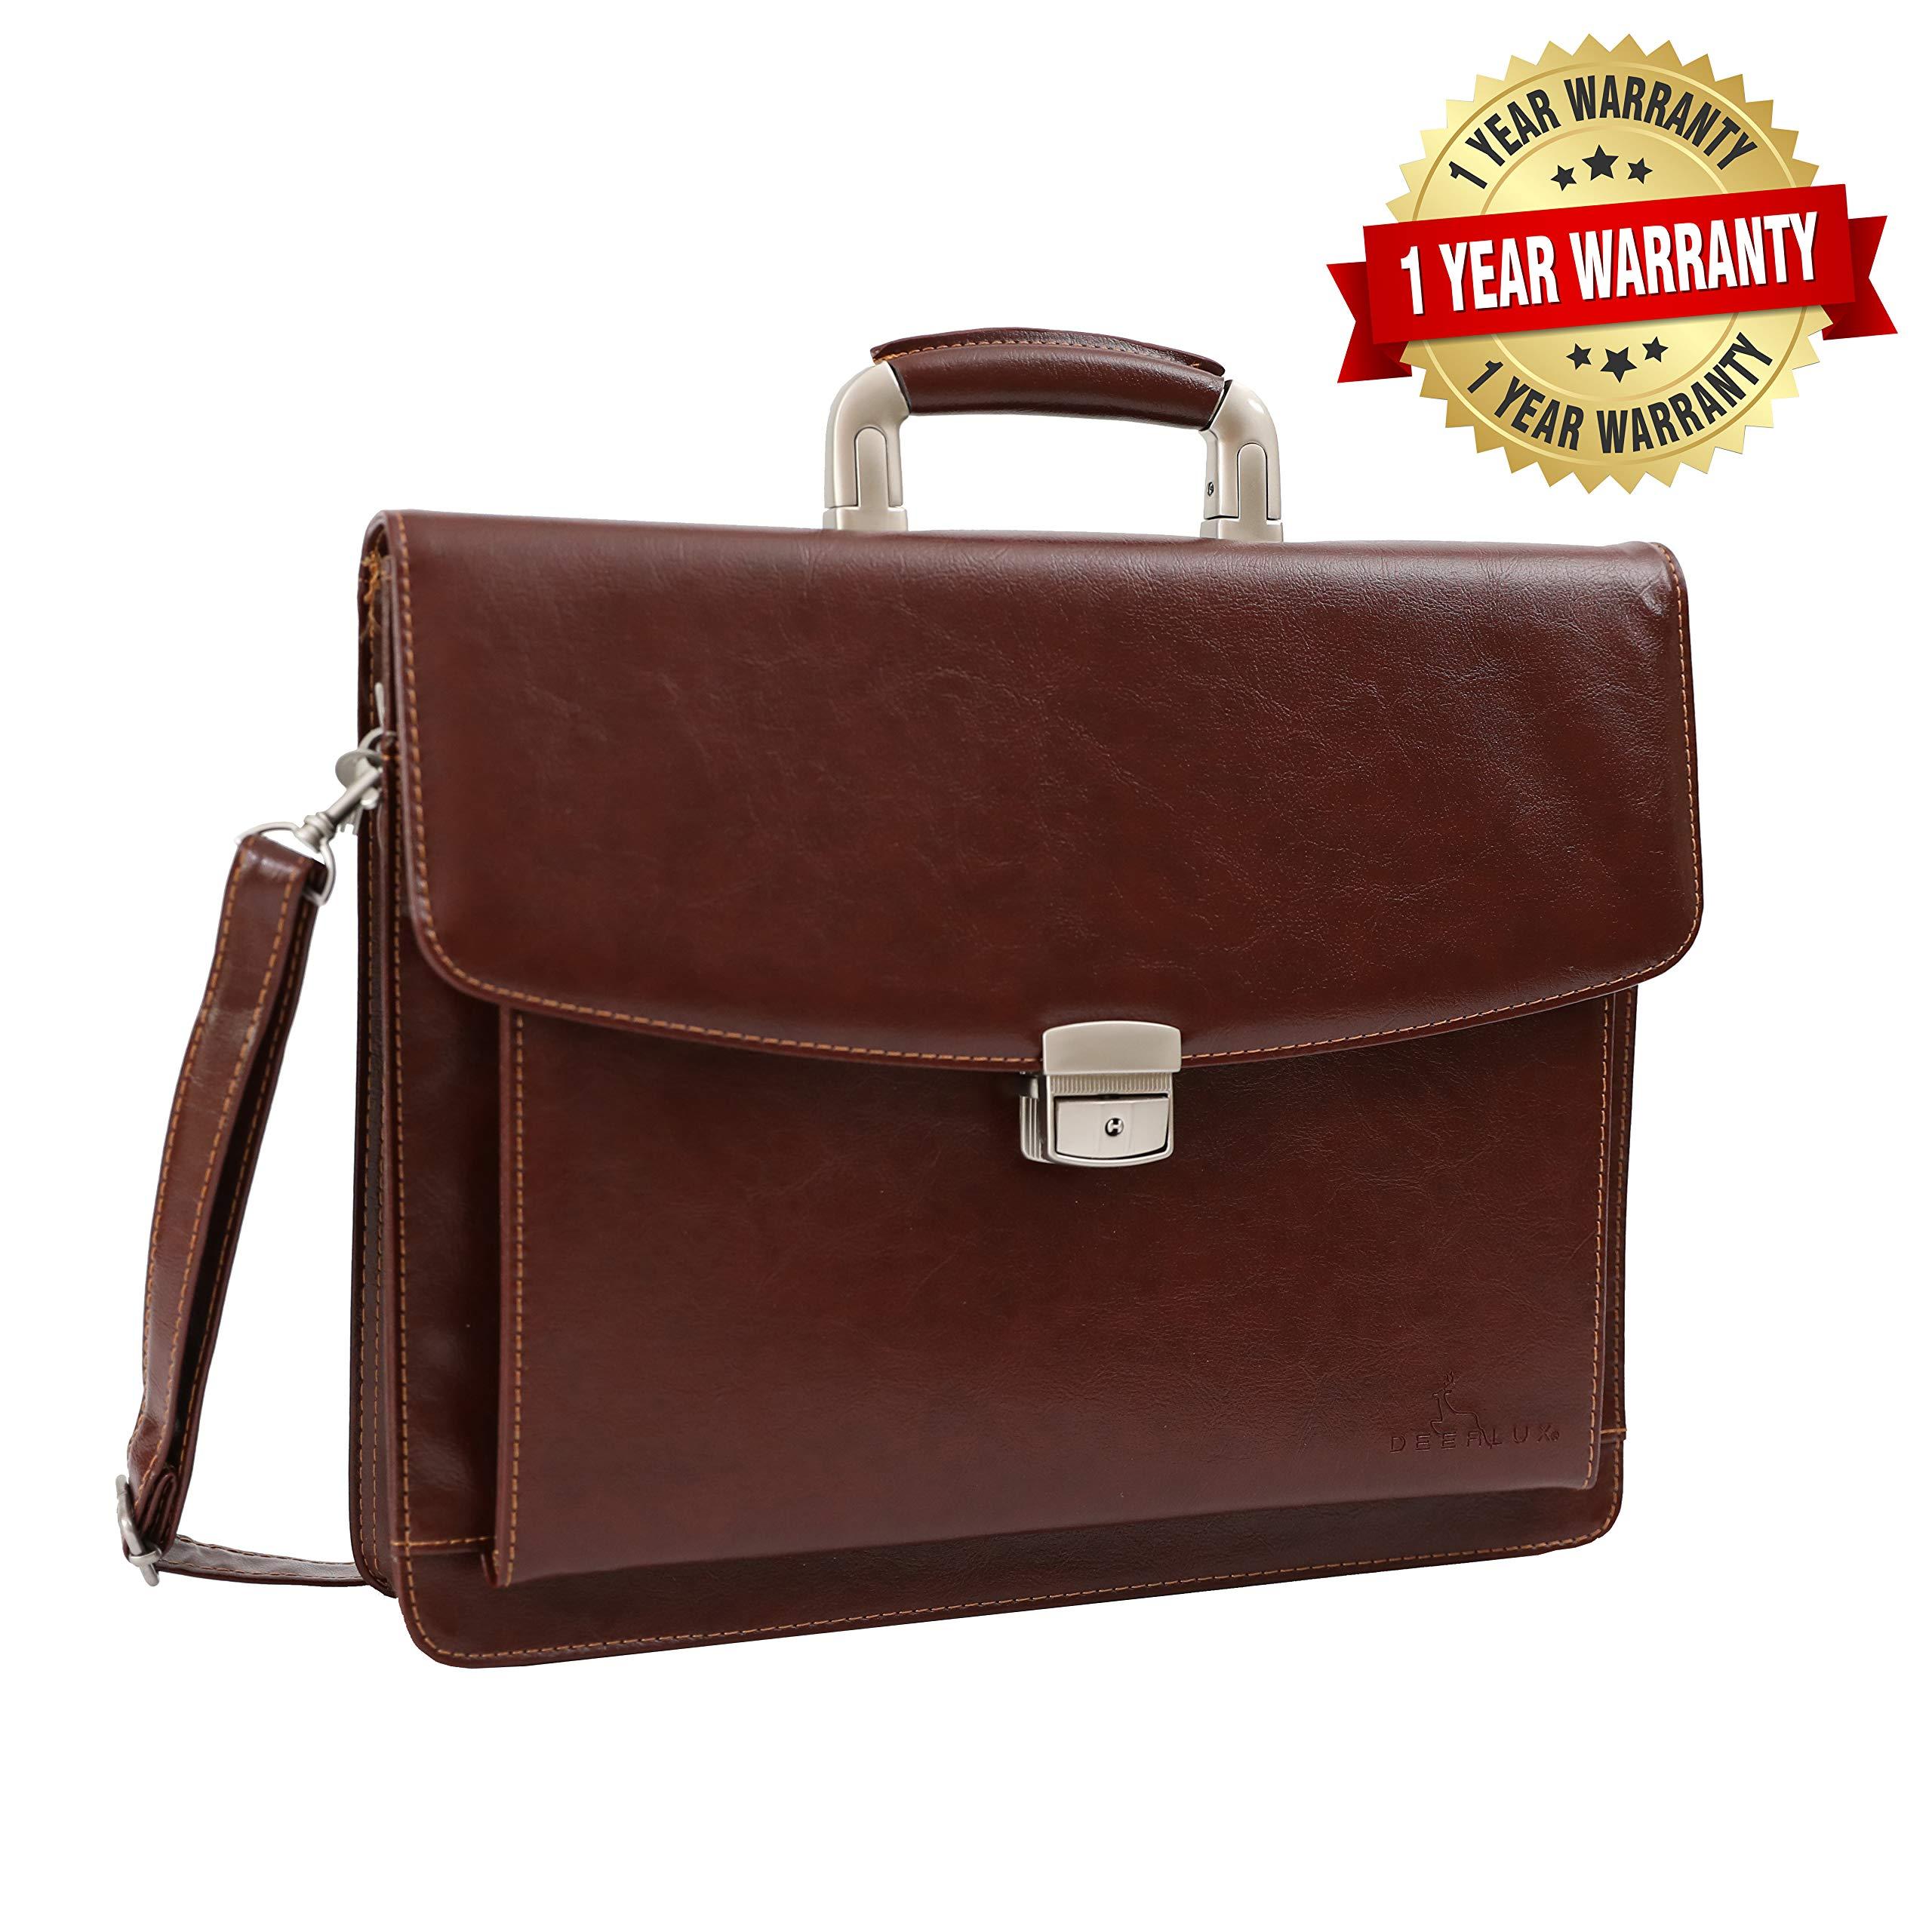 DEERLUX QI003305 Leather Briefcase, Mens Business Messenger Bag for Laptop Brown